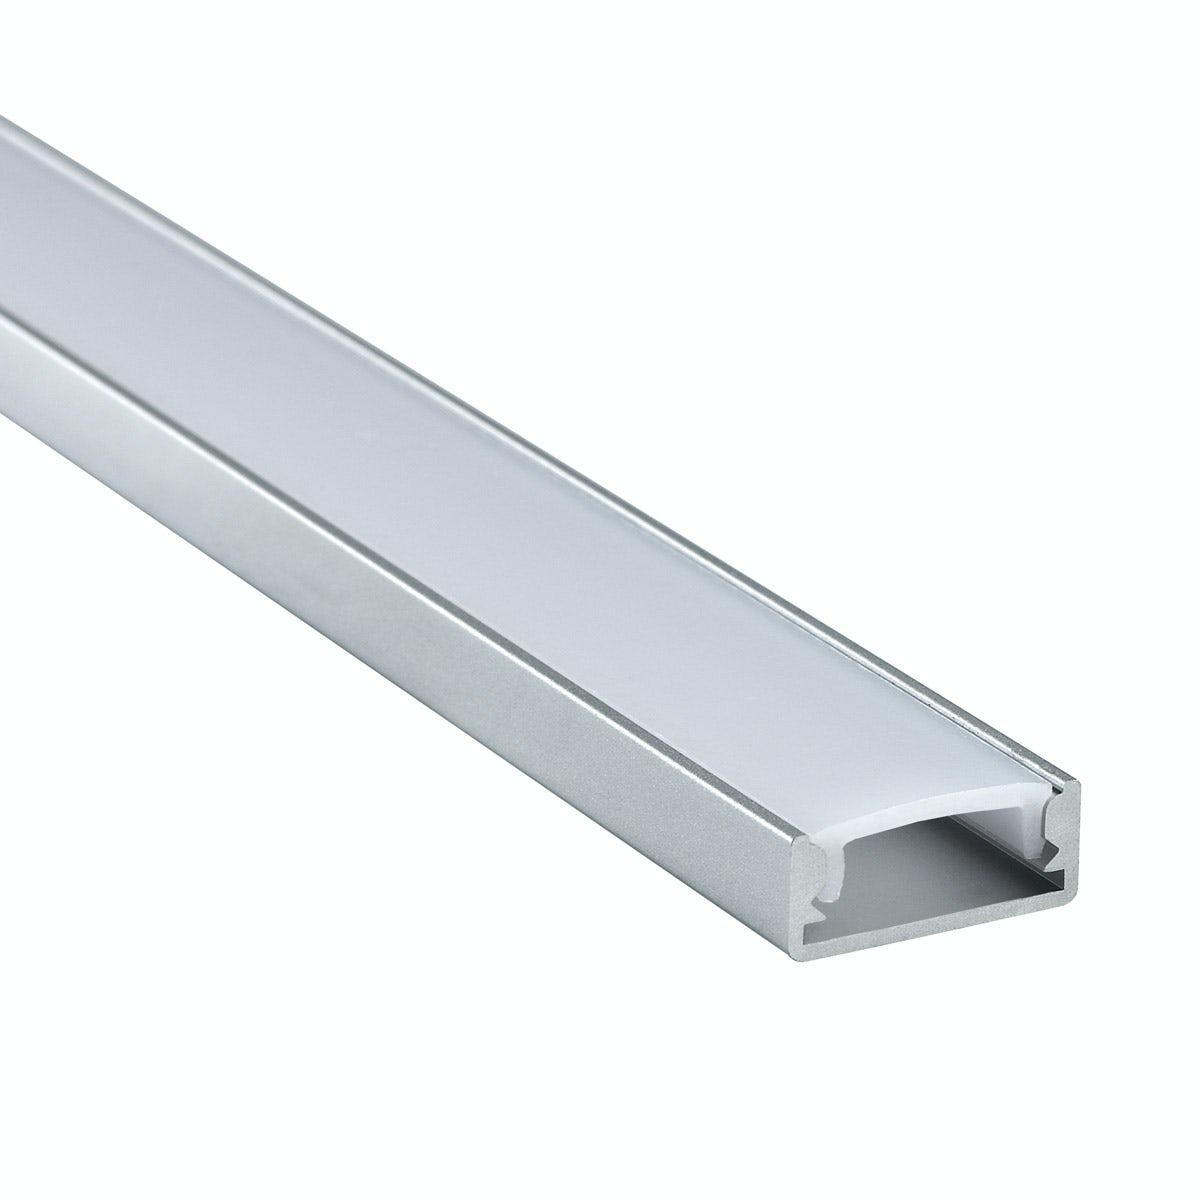 Mode Surface mounted aluminium profile 1m